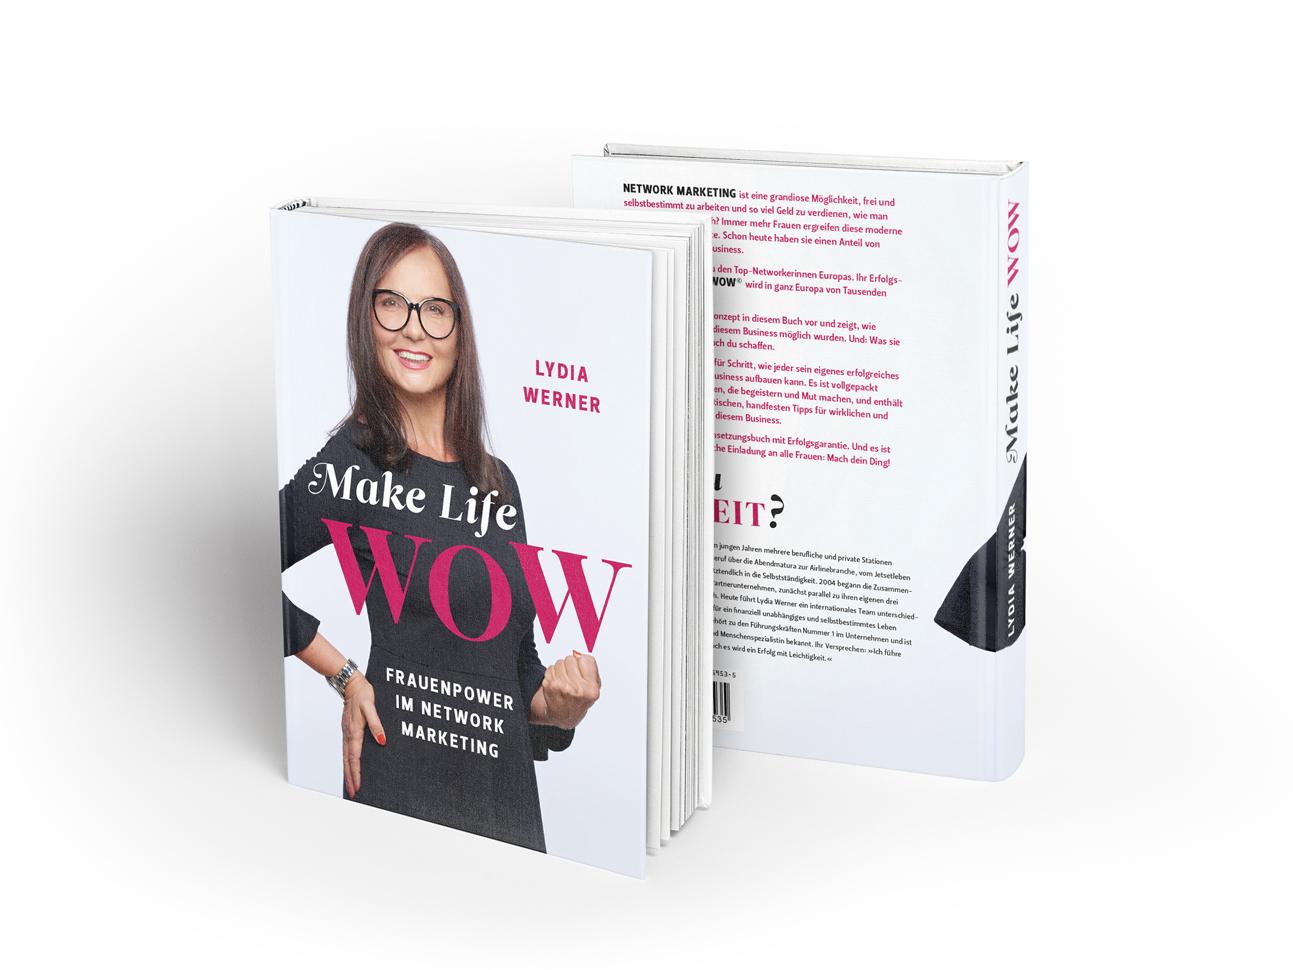 martin zech design, buchcover, self publishing, lydia werner, make life wow